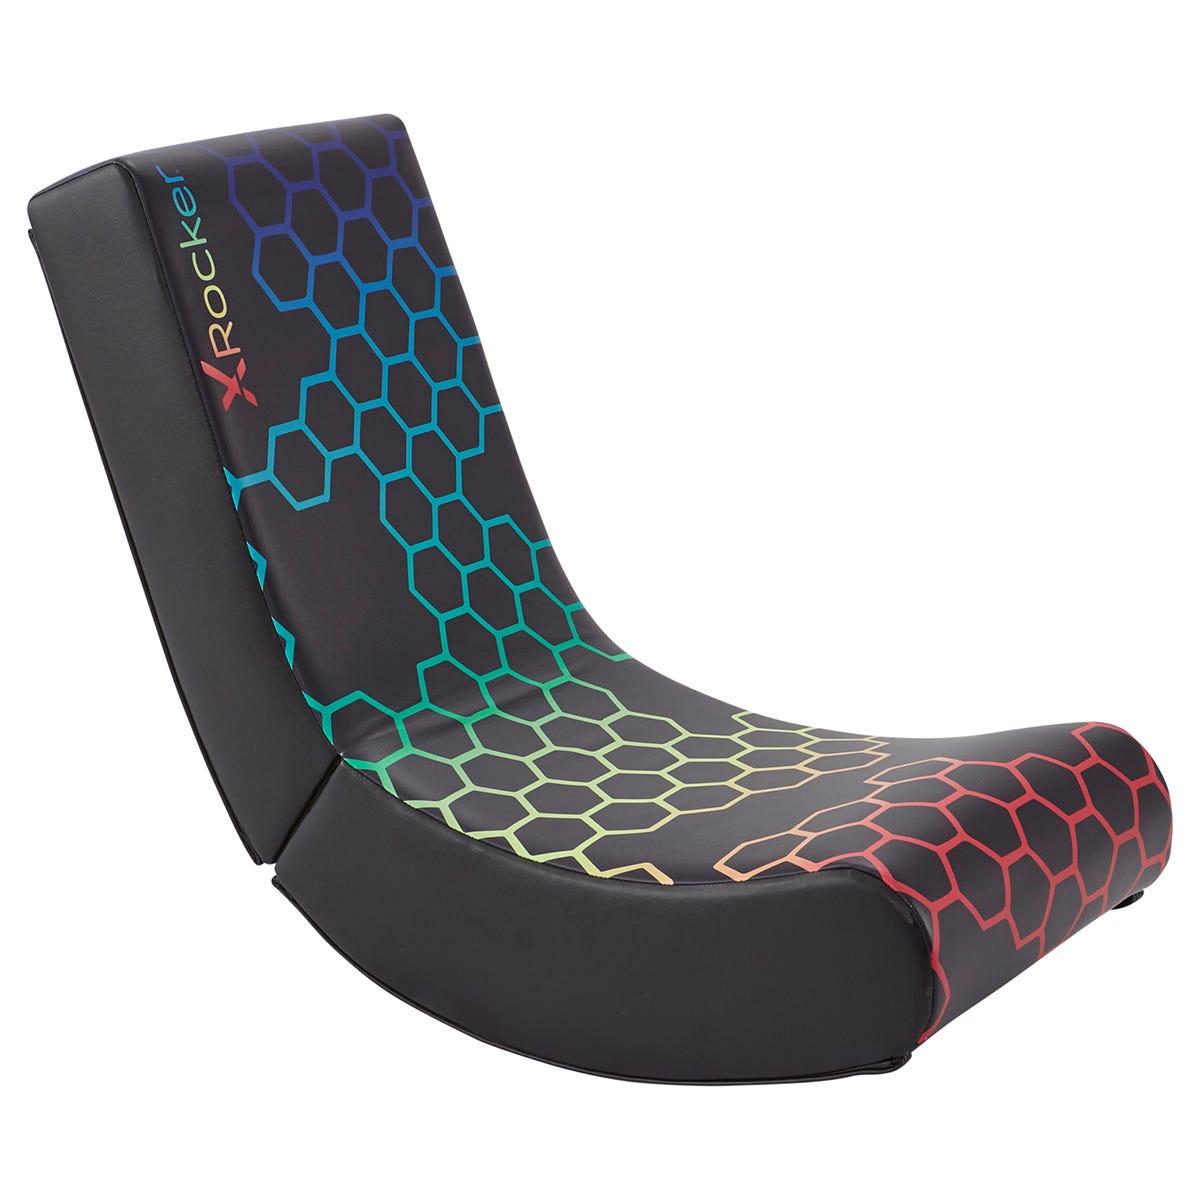 X Rocker X-Rocker Video Rocker Foldable Gaming Chair - RGB Neo Hex